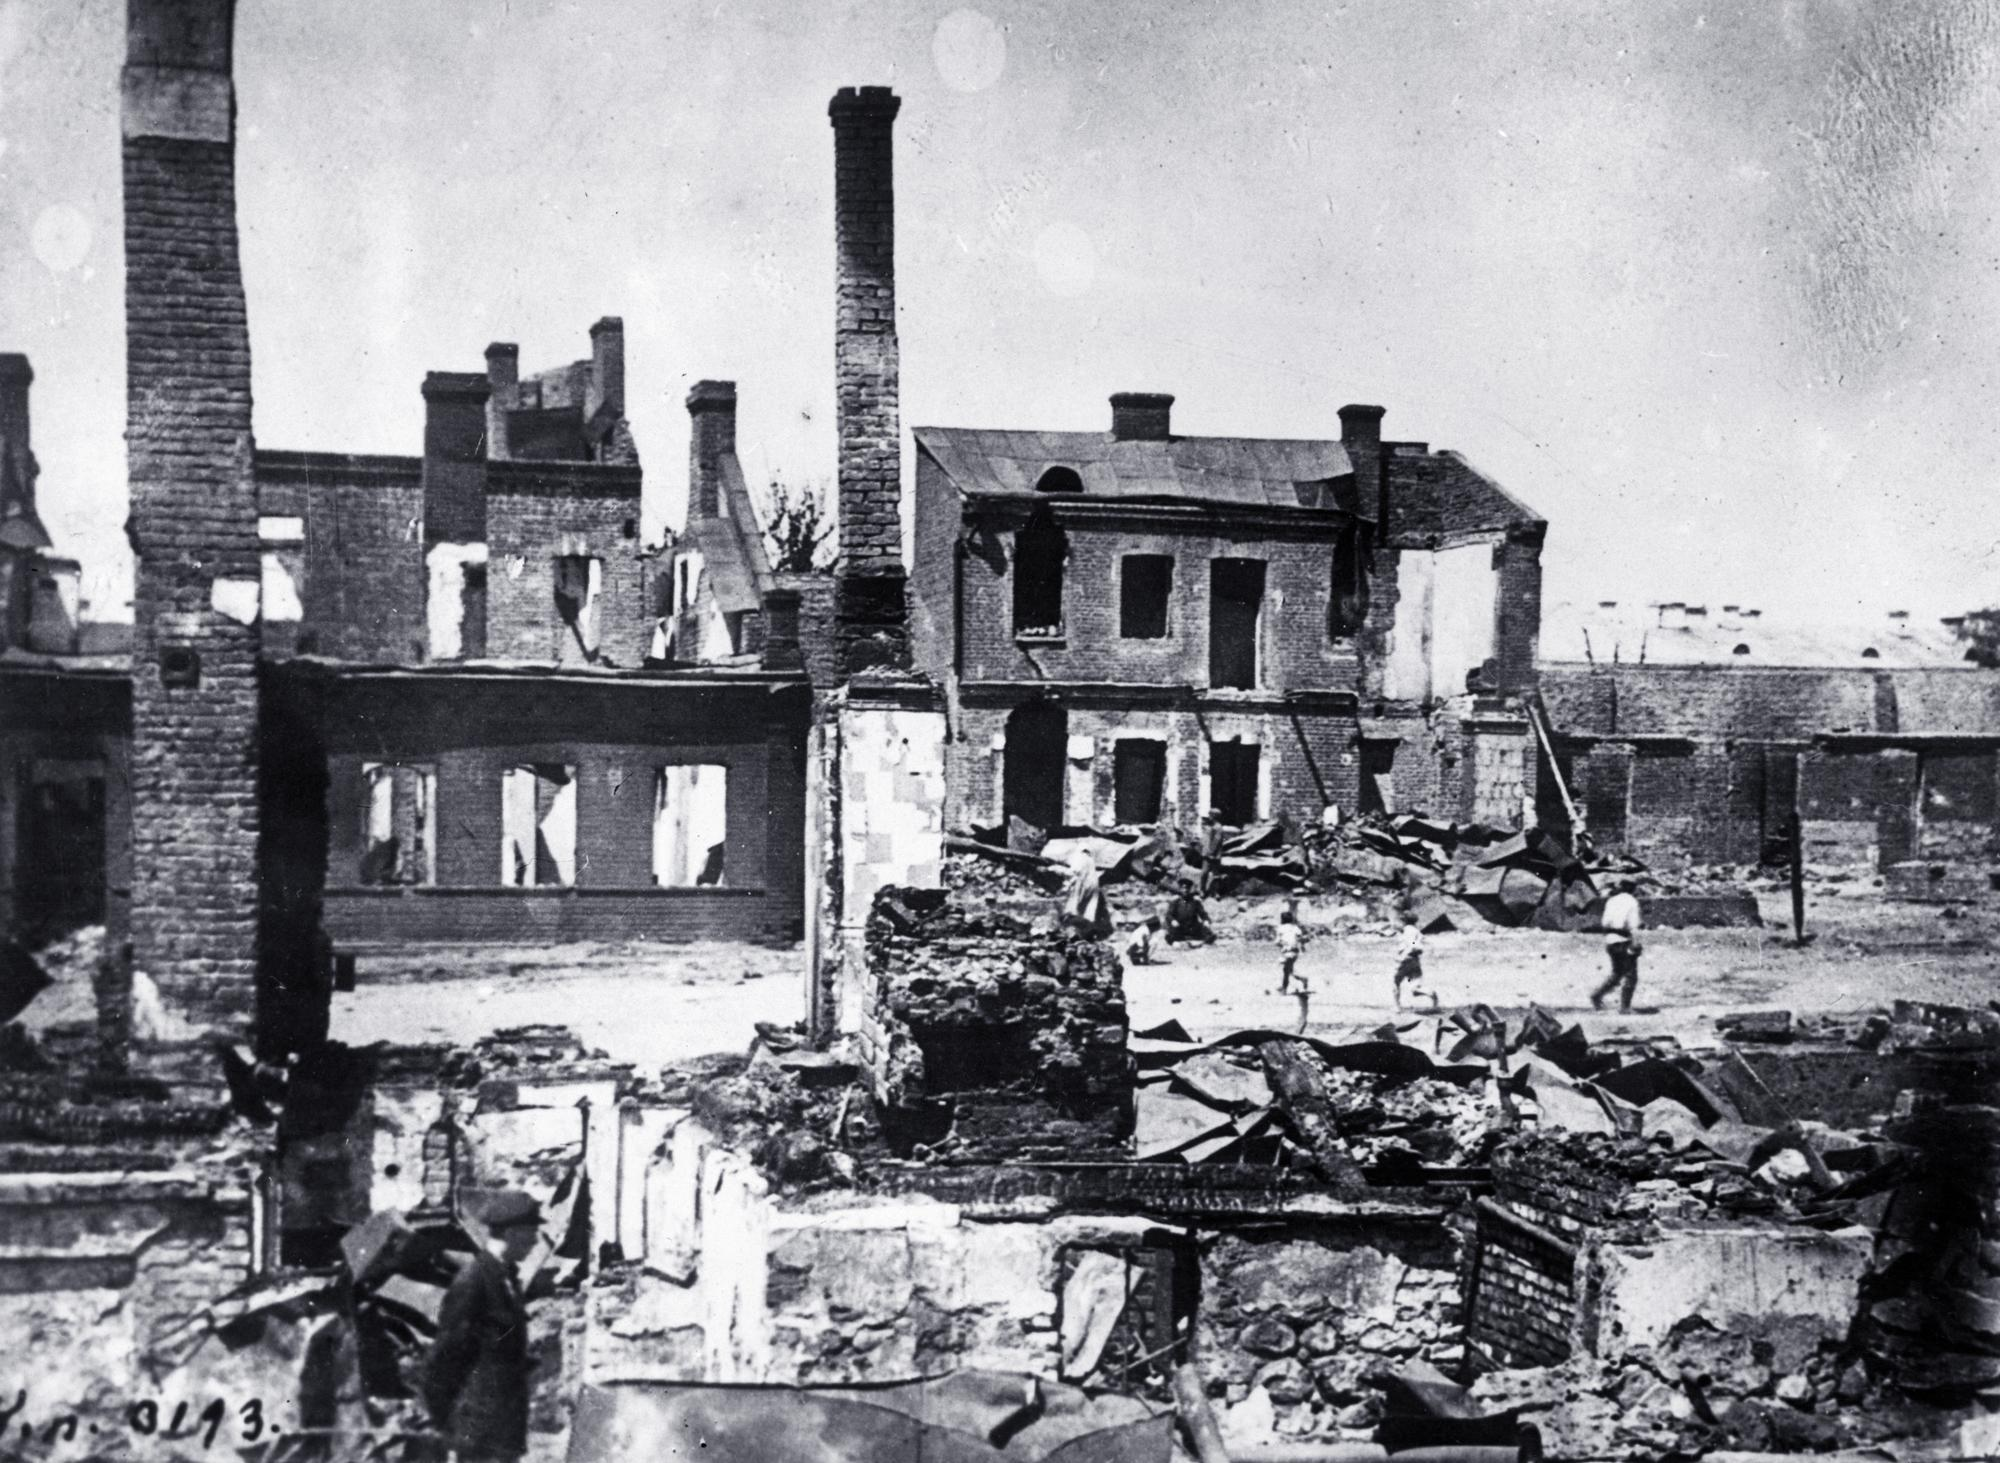 Минск, 1920 год. Фото © Getty Images / Slava Katamidze Collection